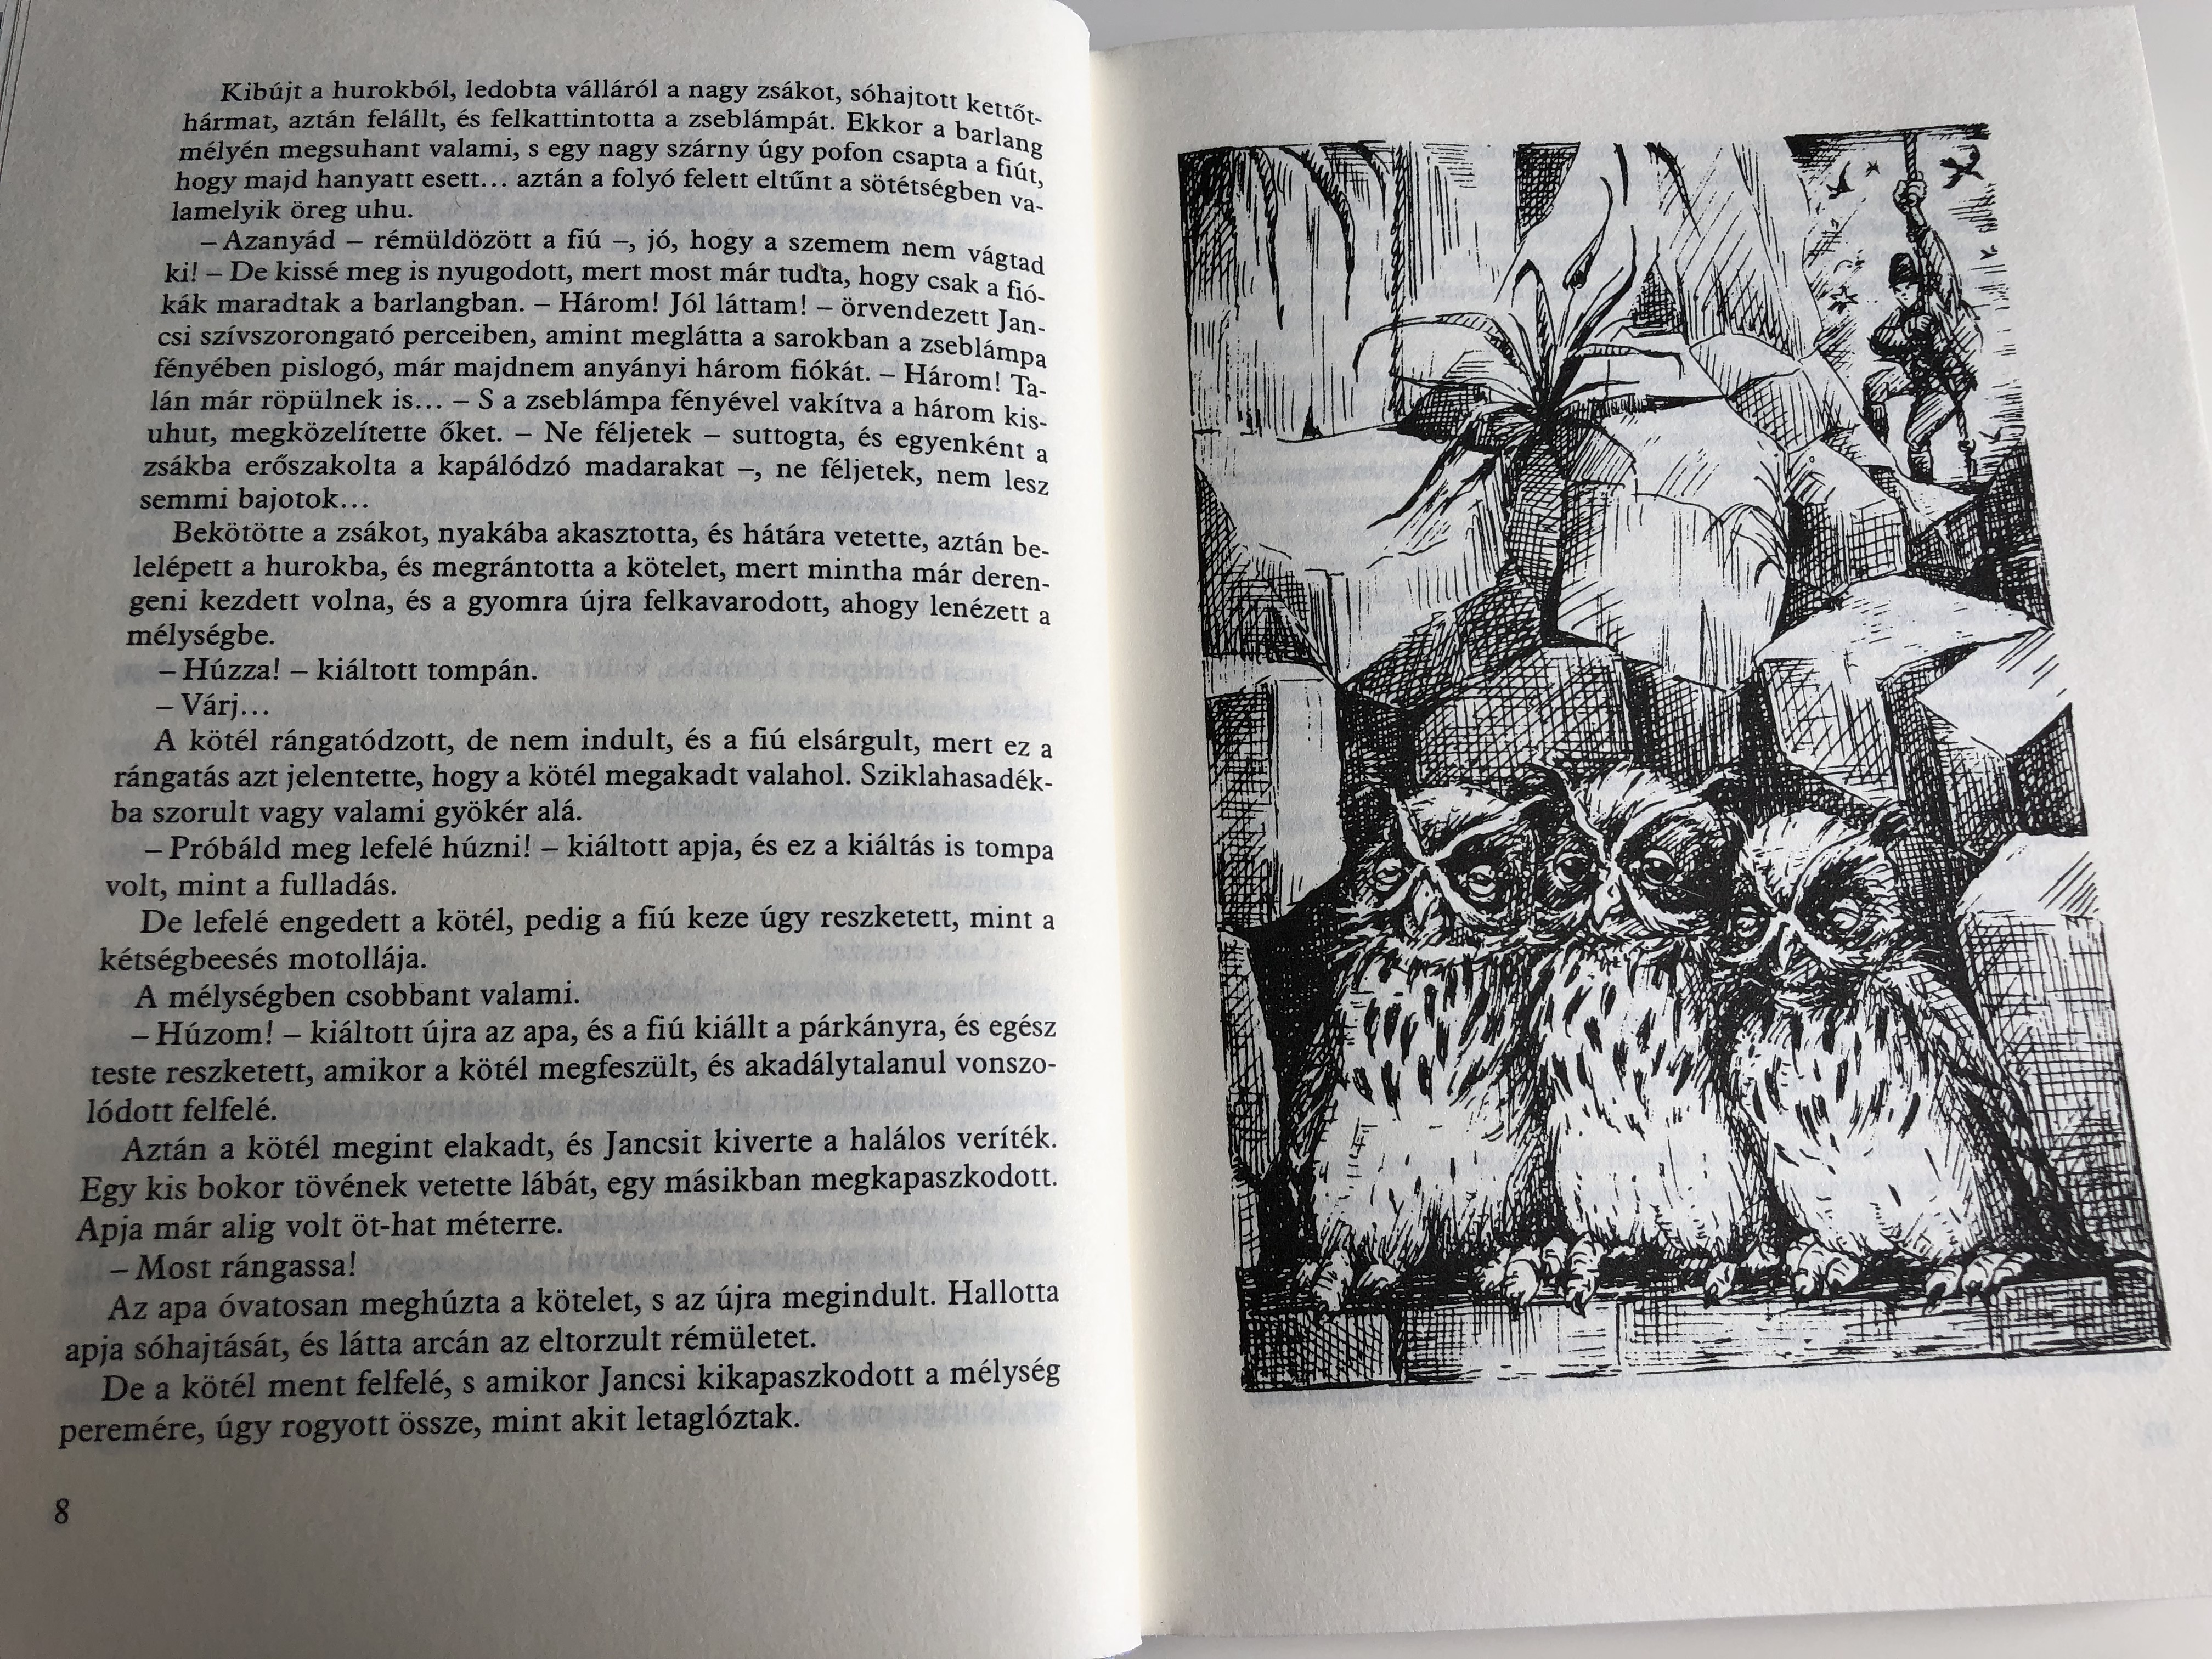 h-by-fekete-istv-n-illustrations-by-bakai-piroska-m-ra-kiad-2013-an-owl-s-novel-by-famous-hungarian-writer-istv-n-fekete-5-.jpg